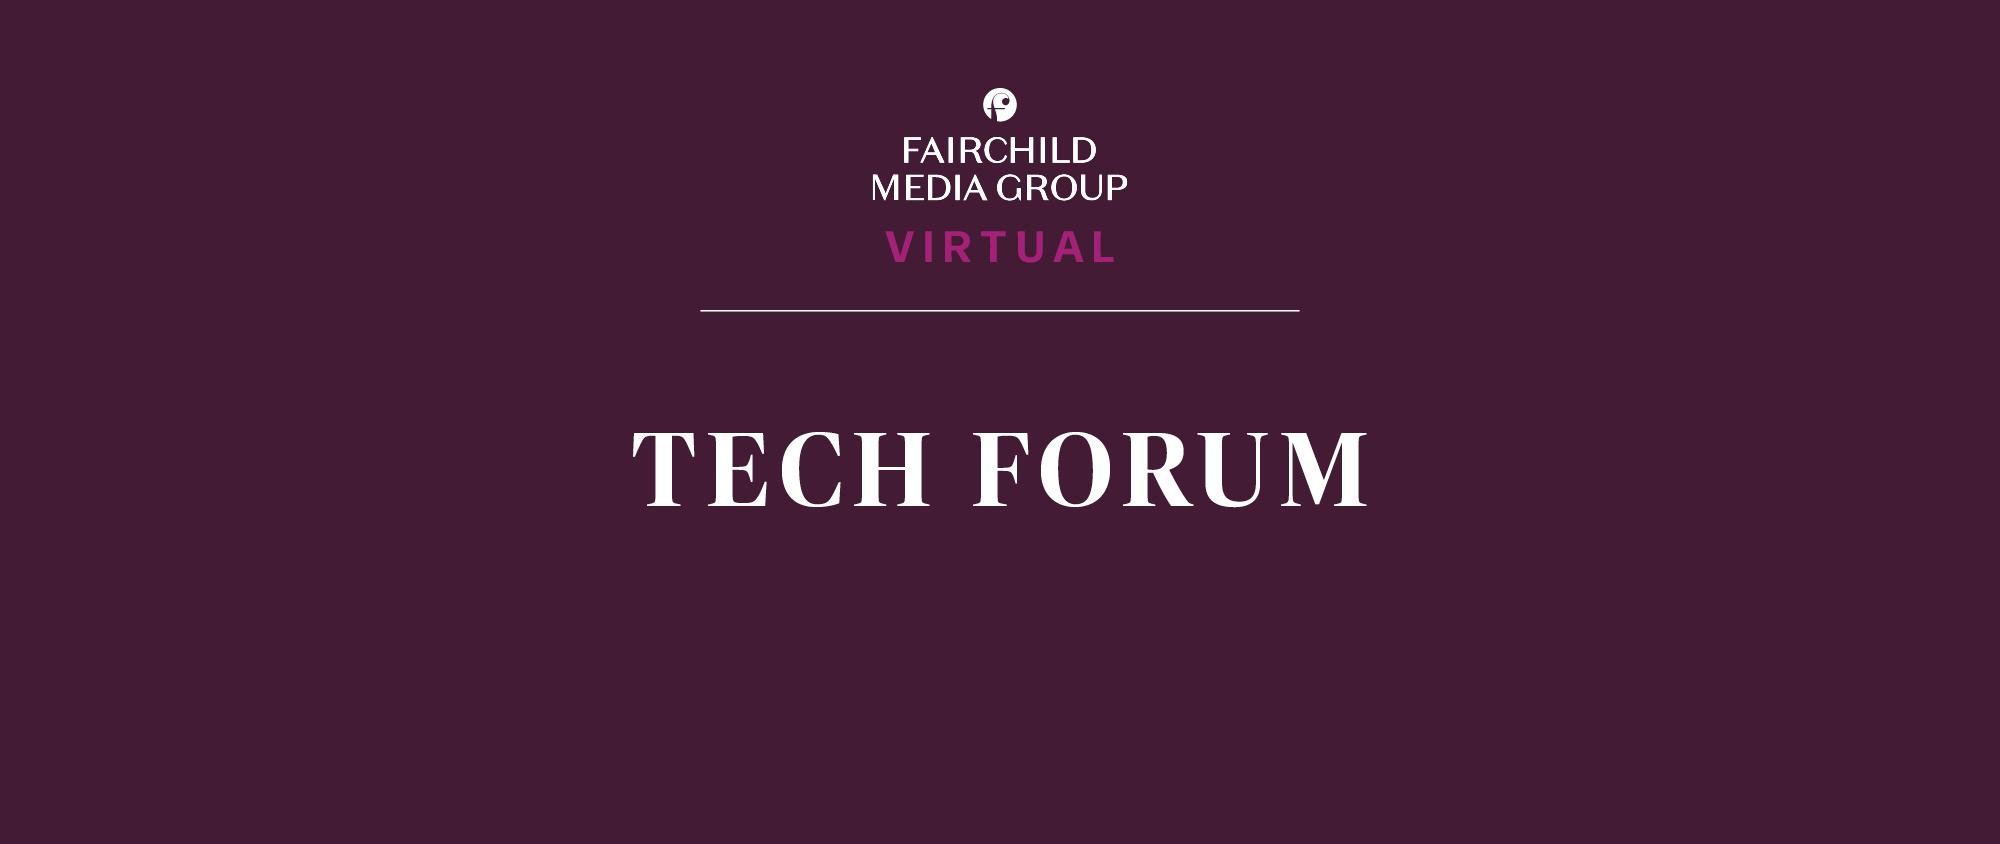 FMG_VIRTUAL_TECH-FORUM